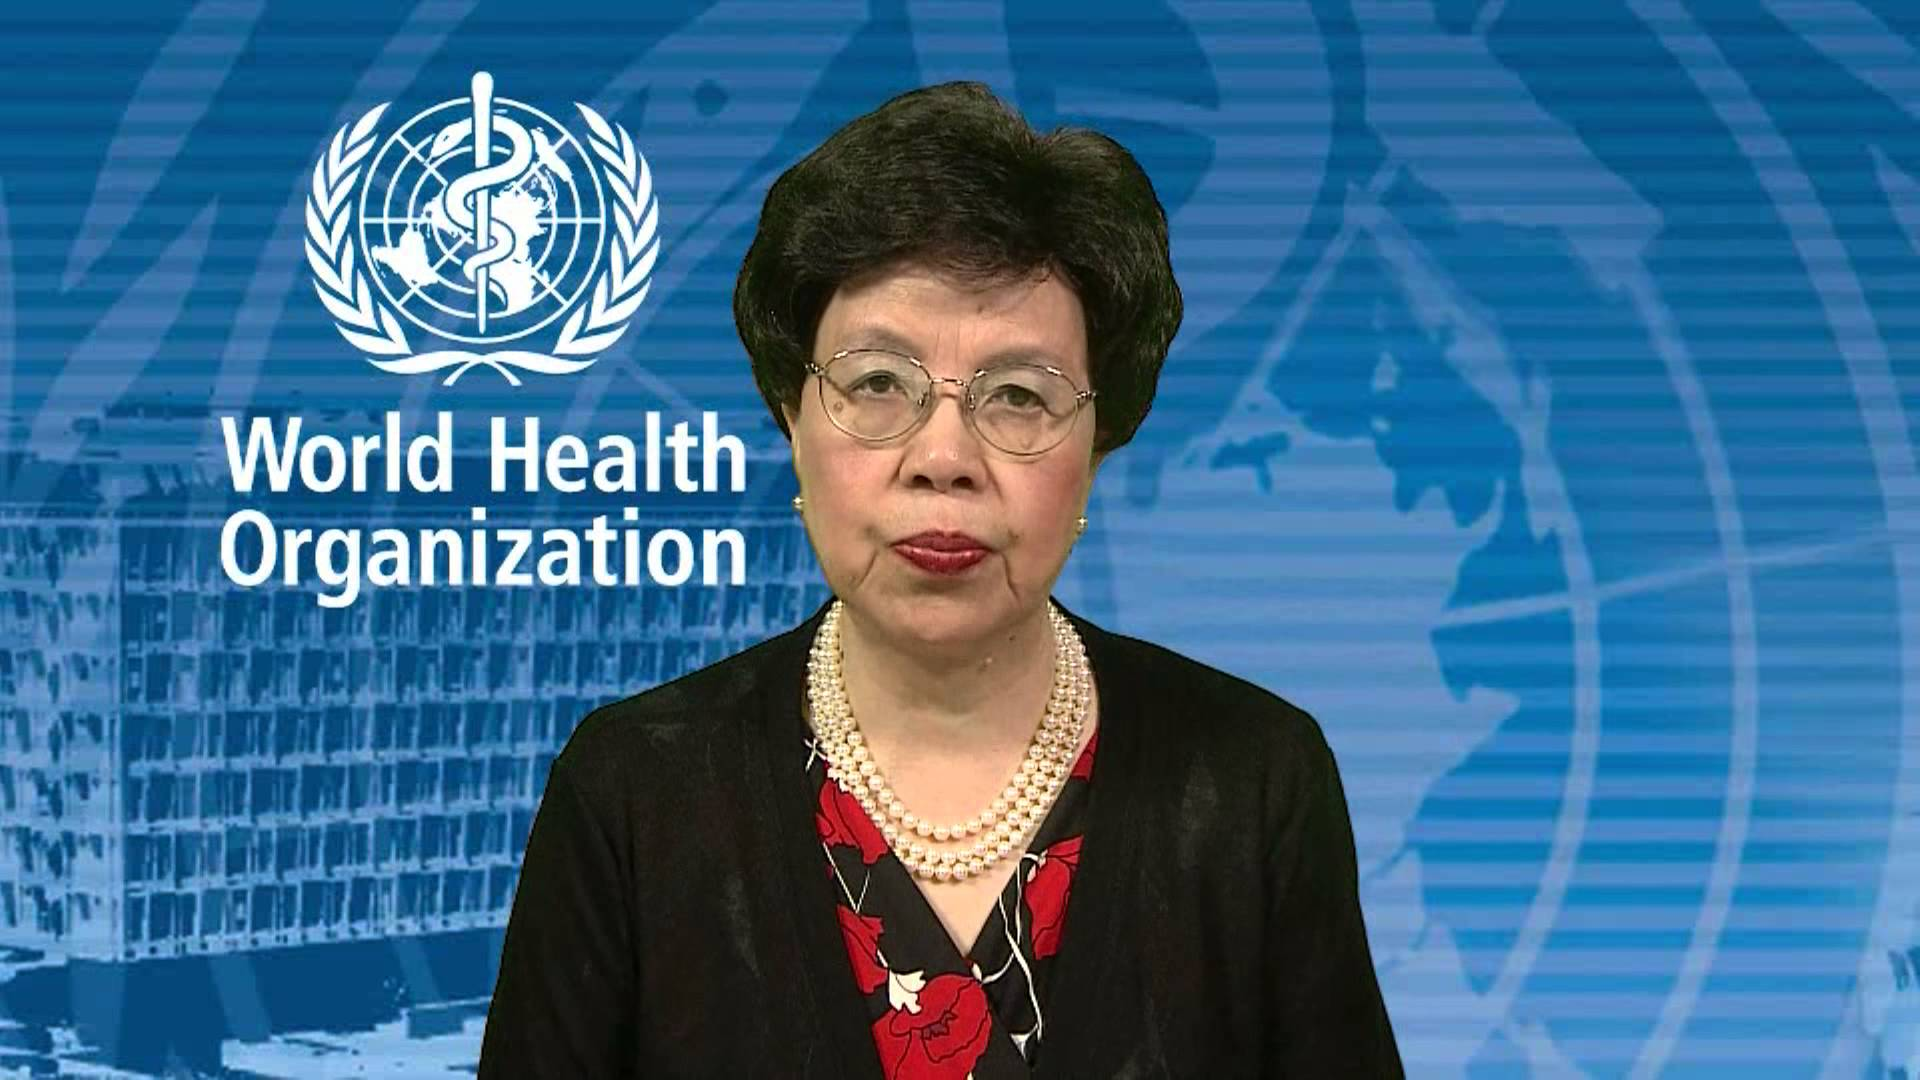 https://patienttalk.org/wp-content/uploads/2016/02/Dr-Margaret-Chan-Director-General-of-WHO.jpg